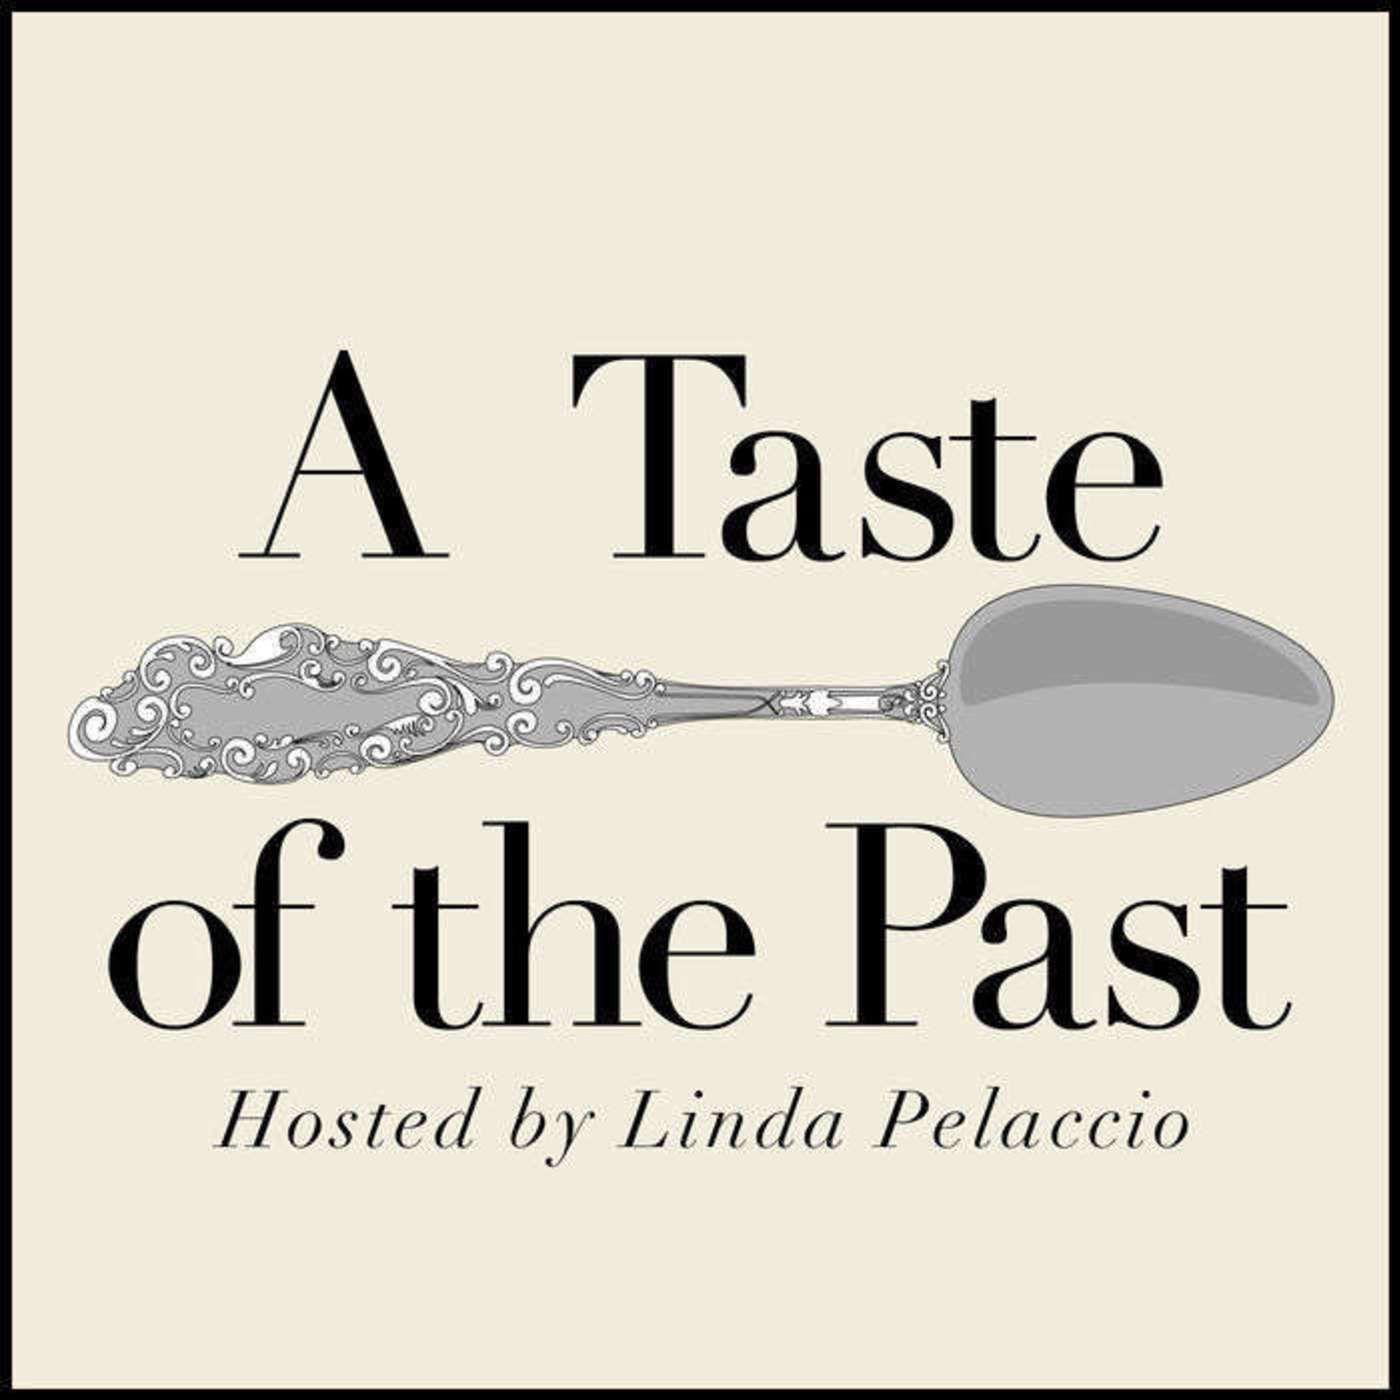 Episode 140: Coffee History